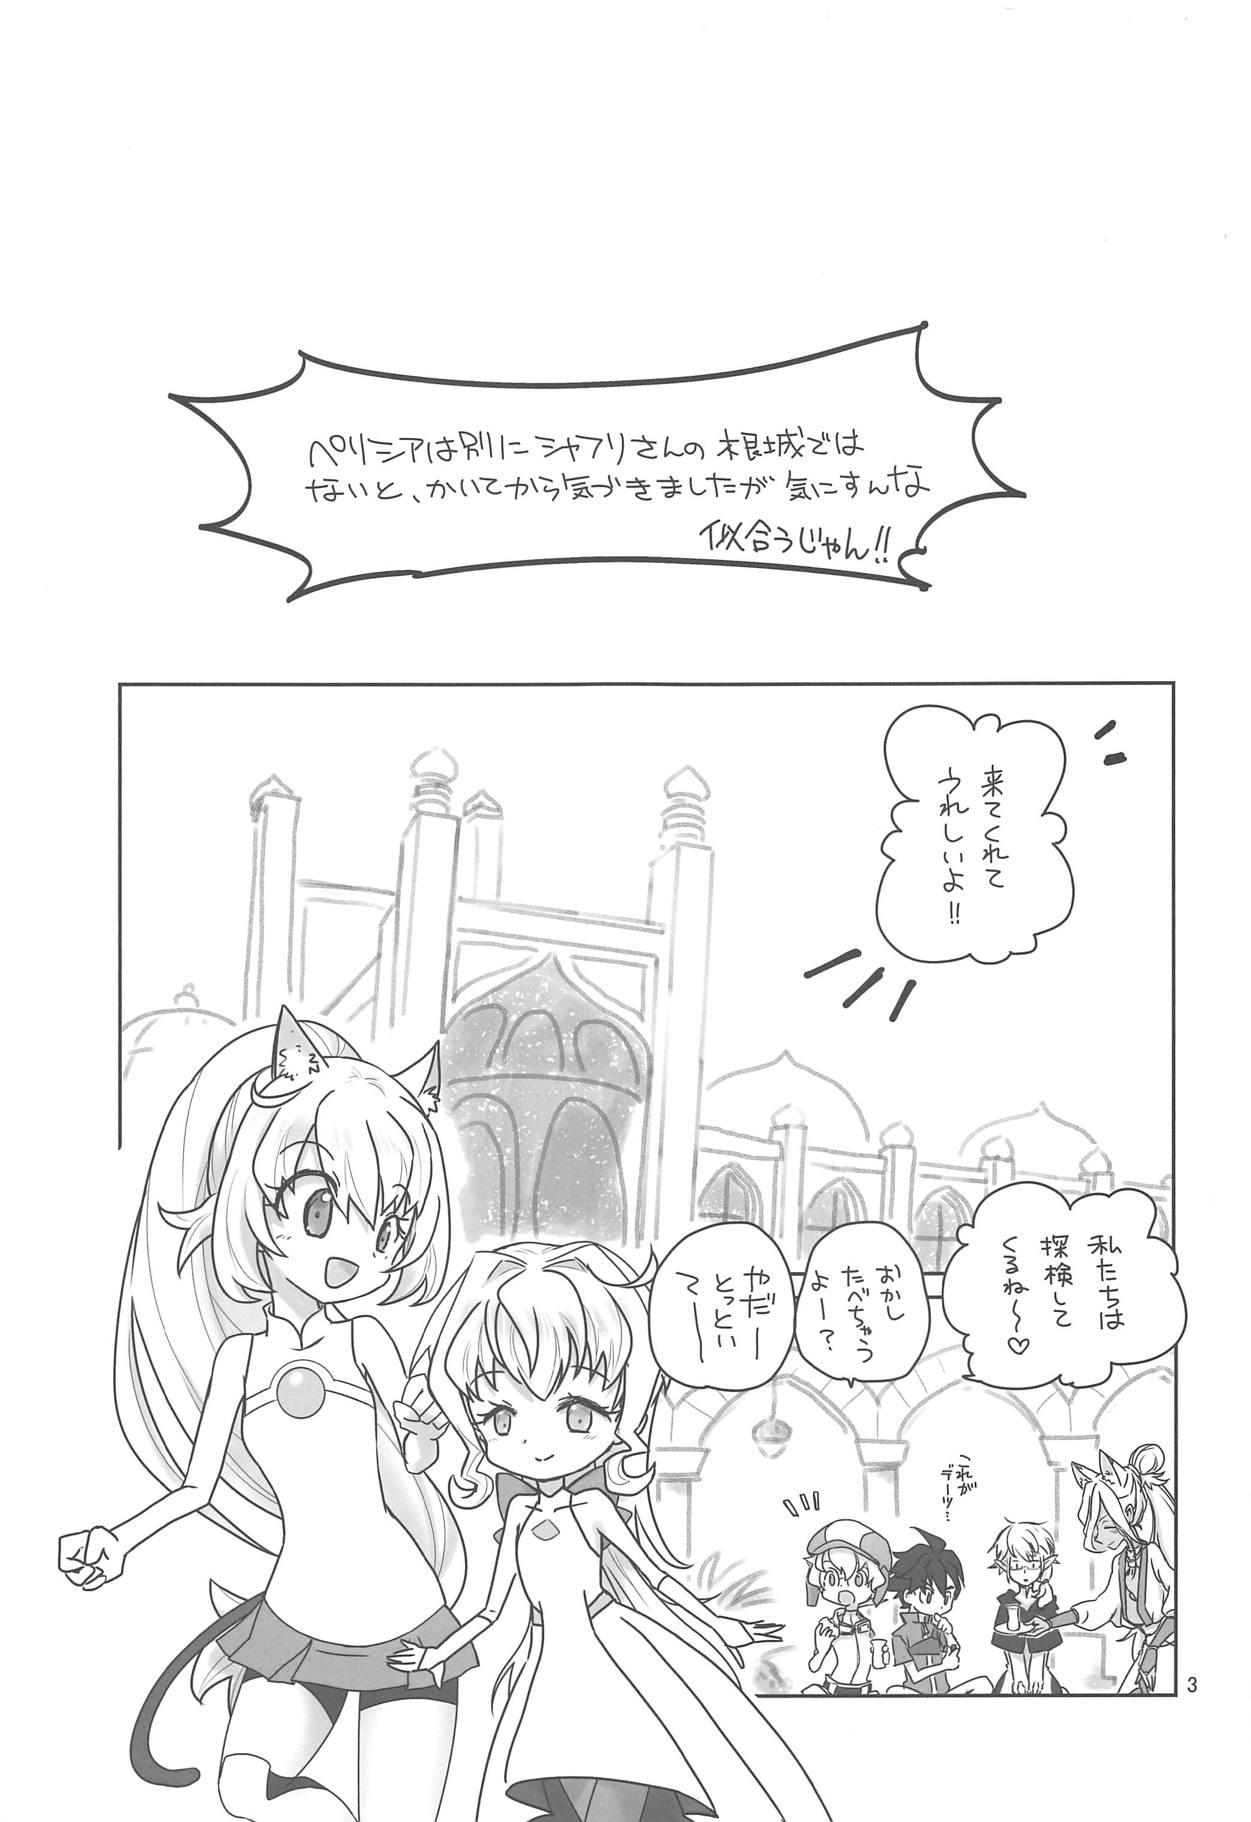 Build Daisuki 1